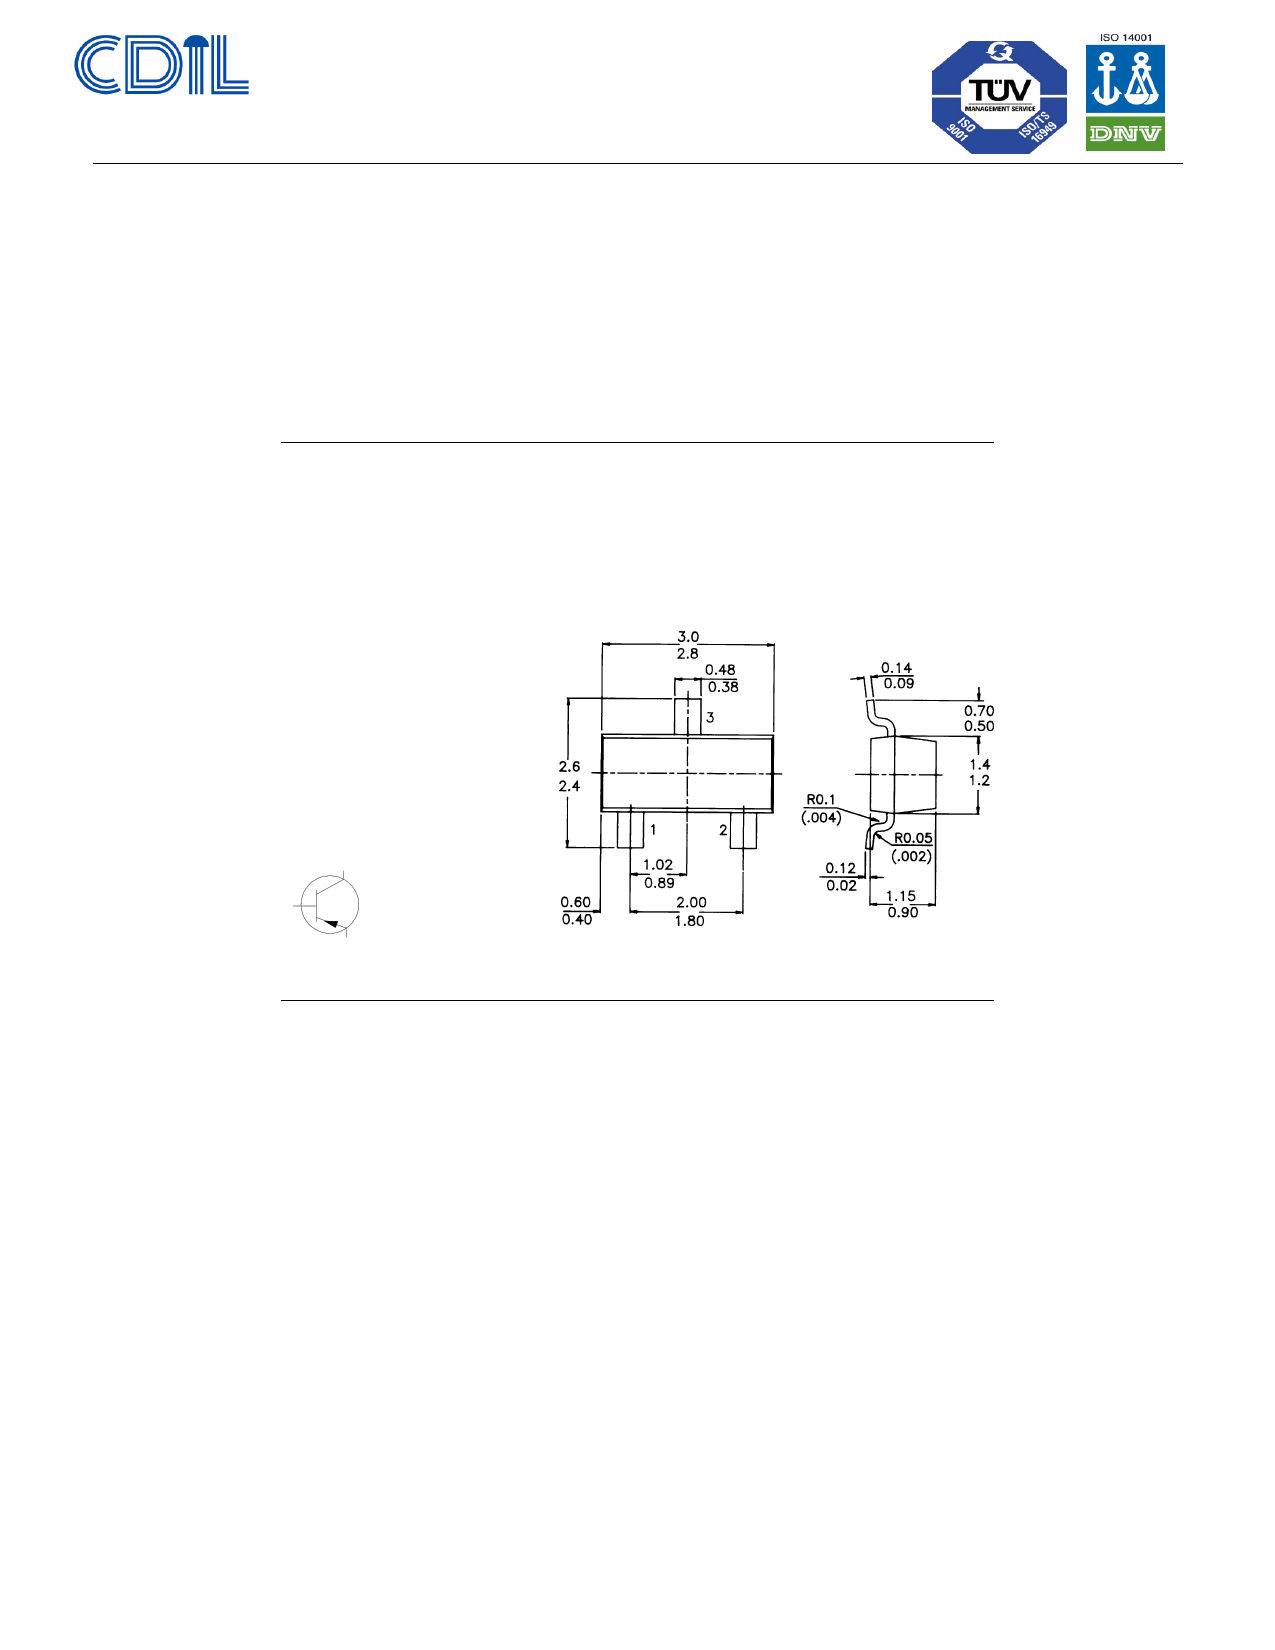 BCX71G 데이터시트 및 BCX71G PDF